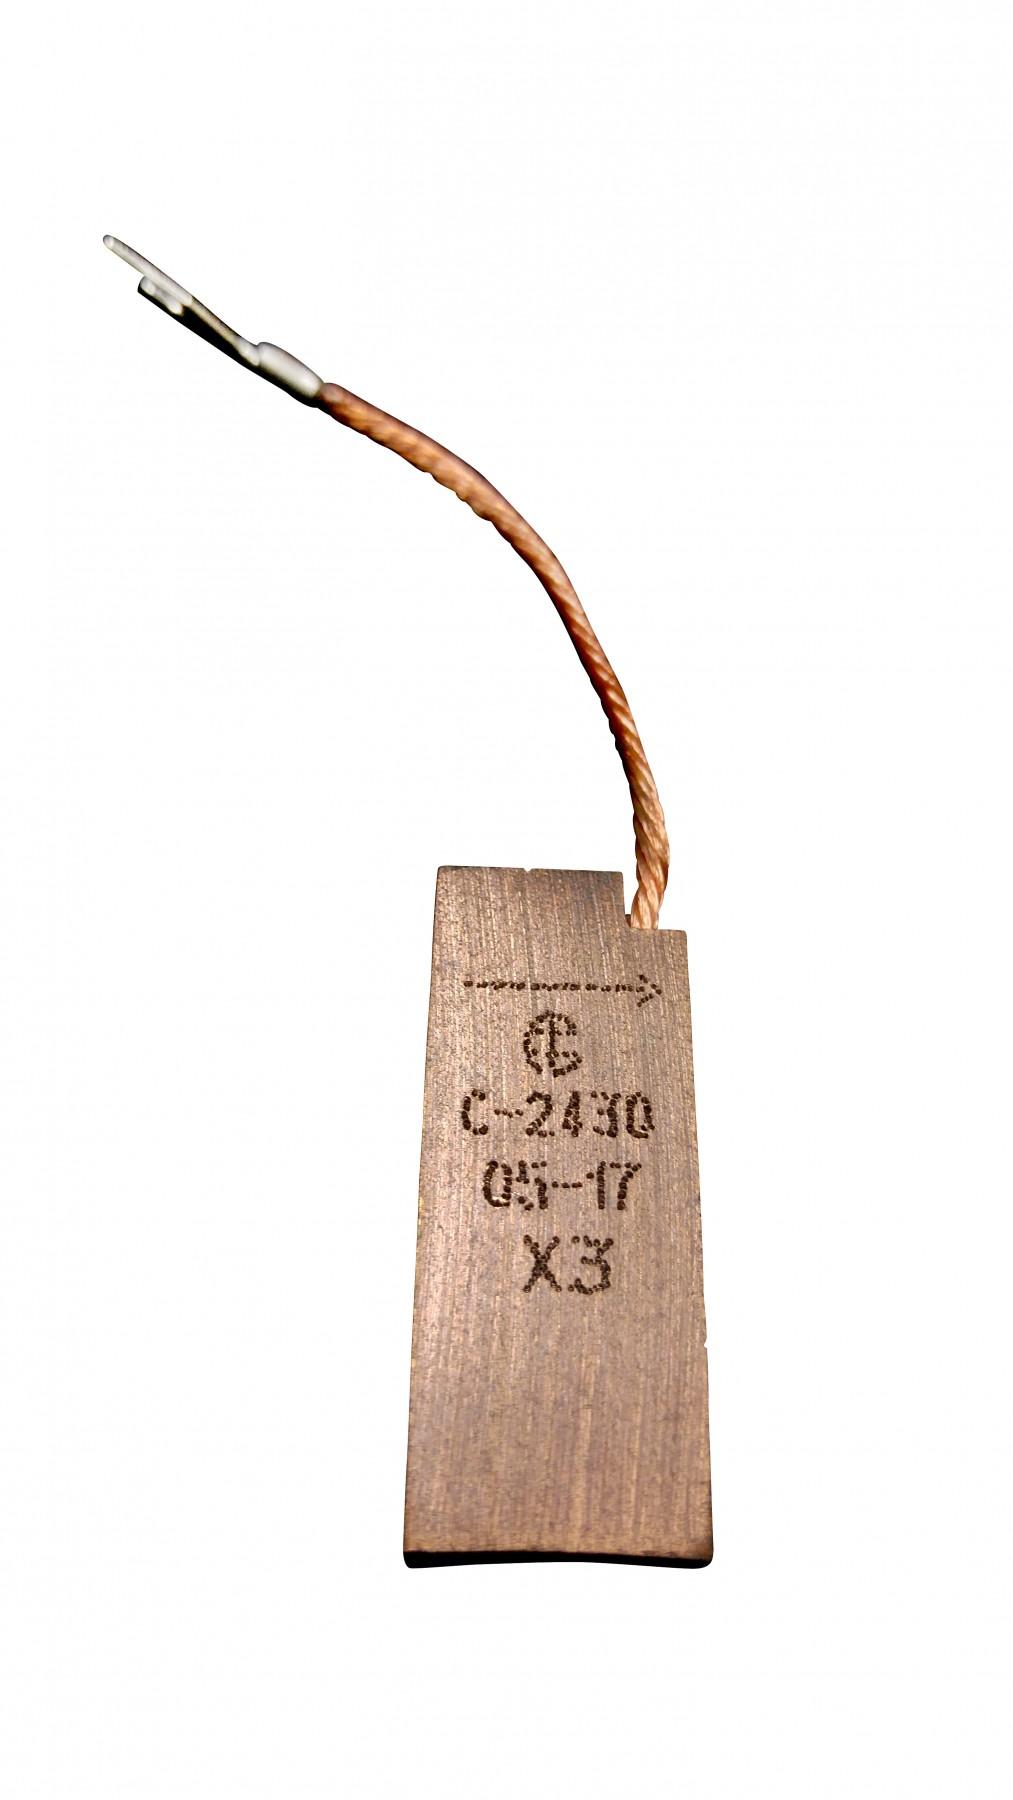 Mersen: Winergy Carbon Brush: C-2430-X3